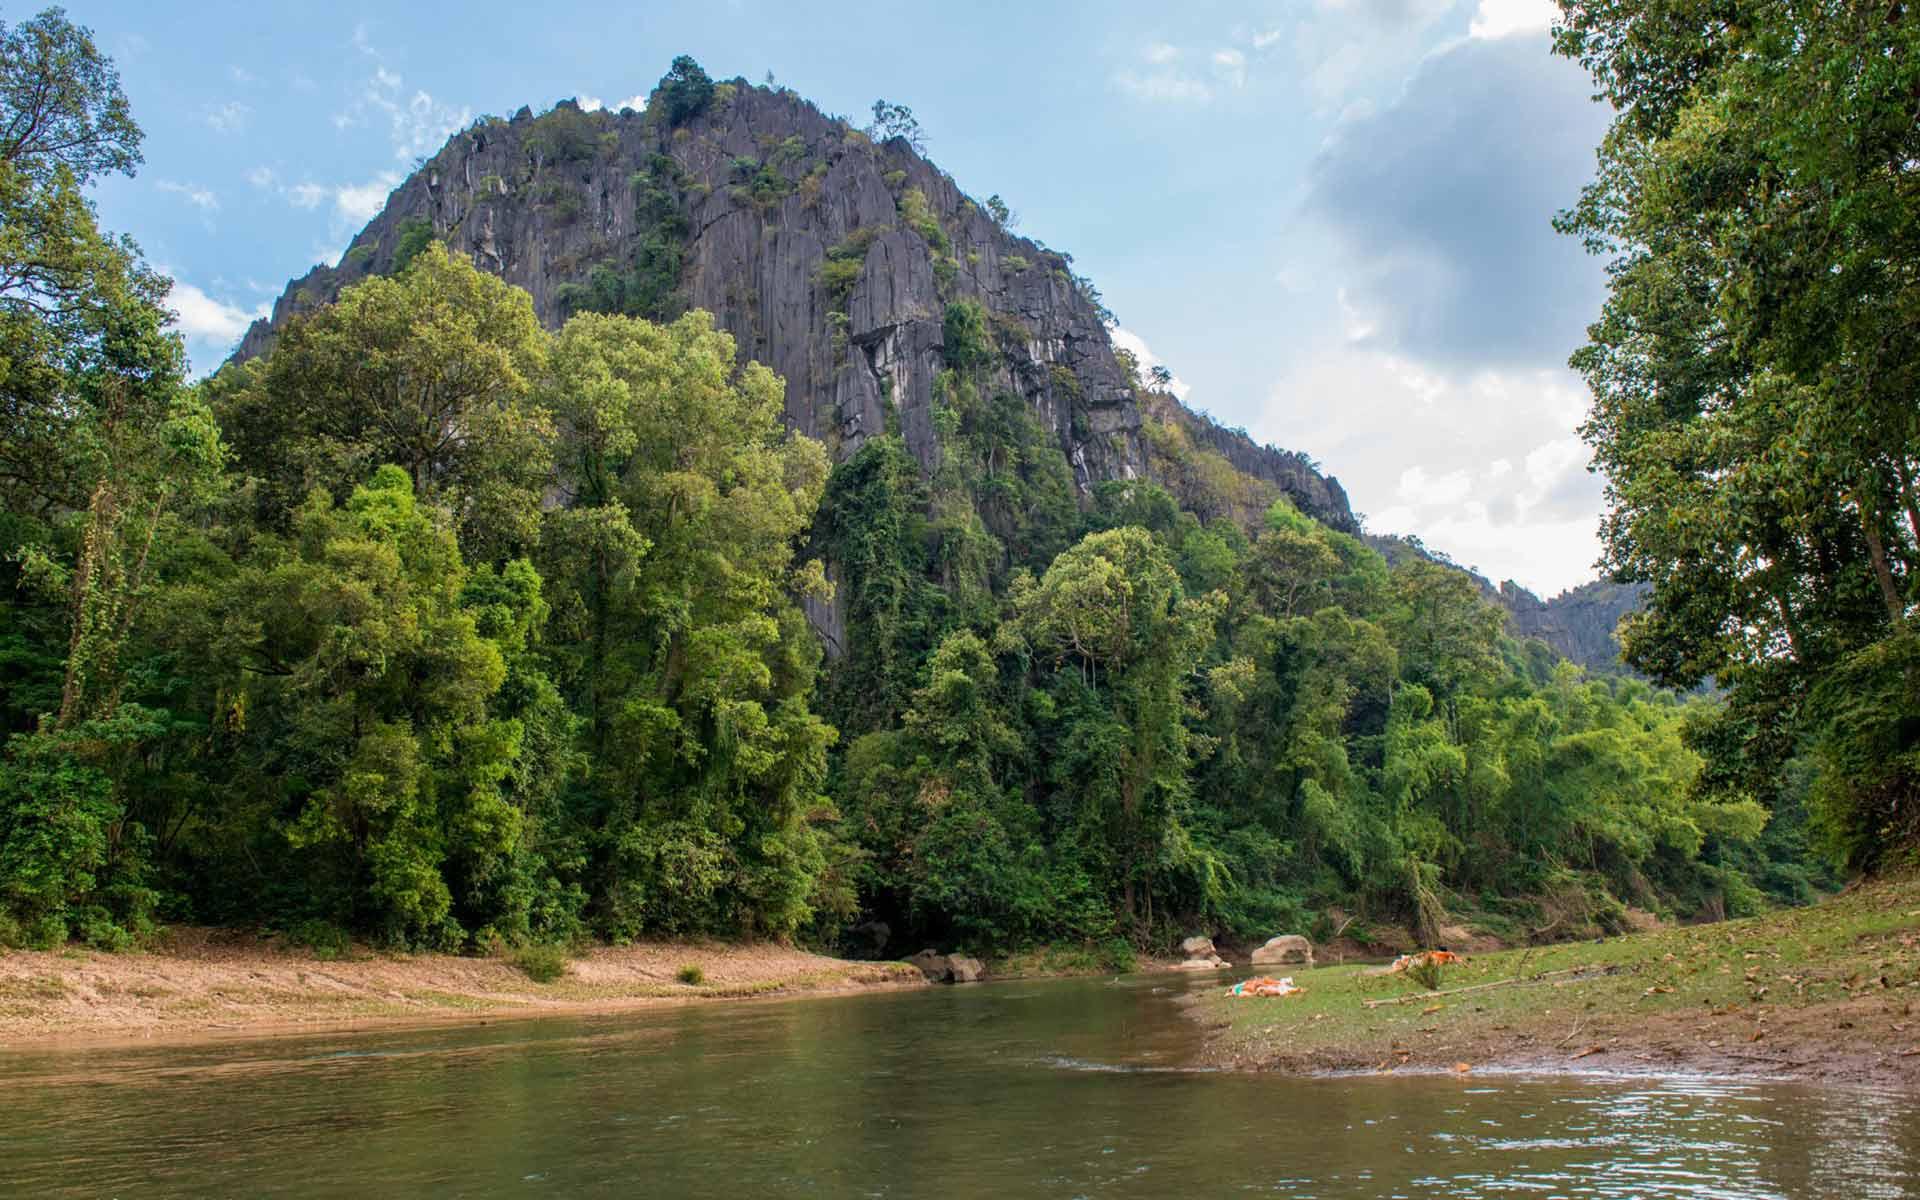 Mountain in longlor village